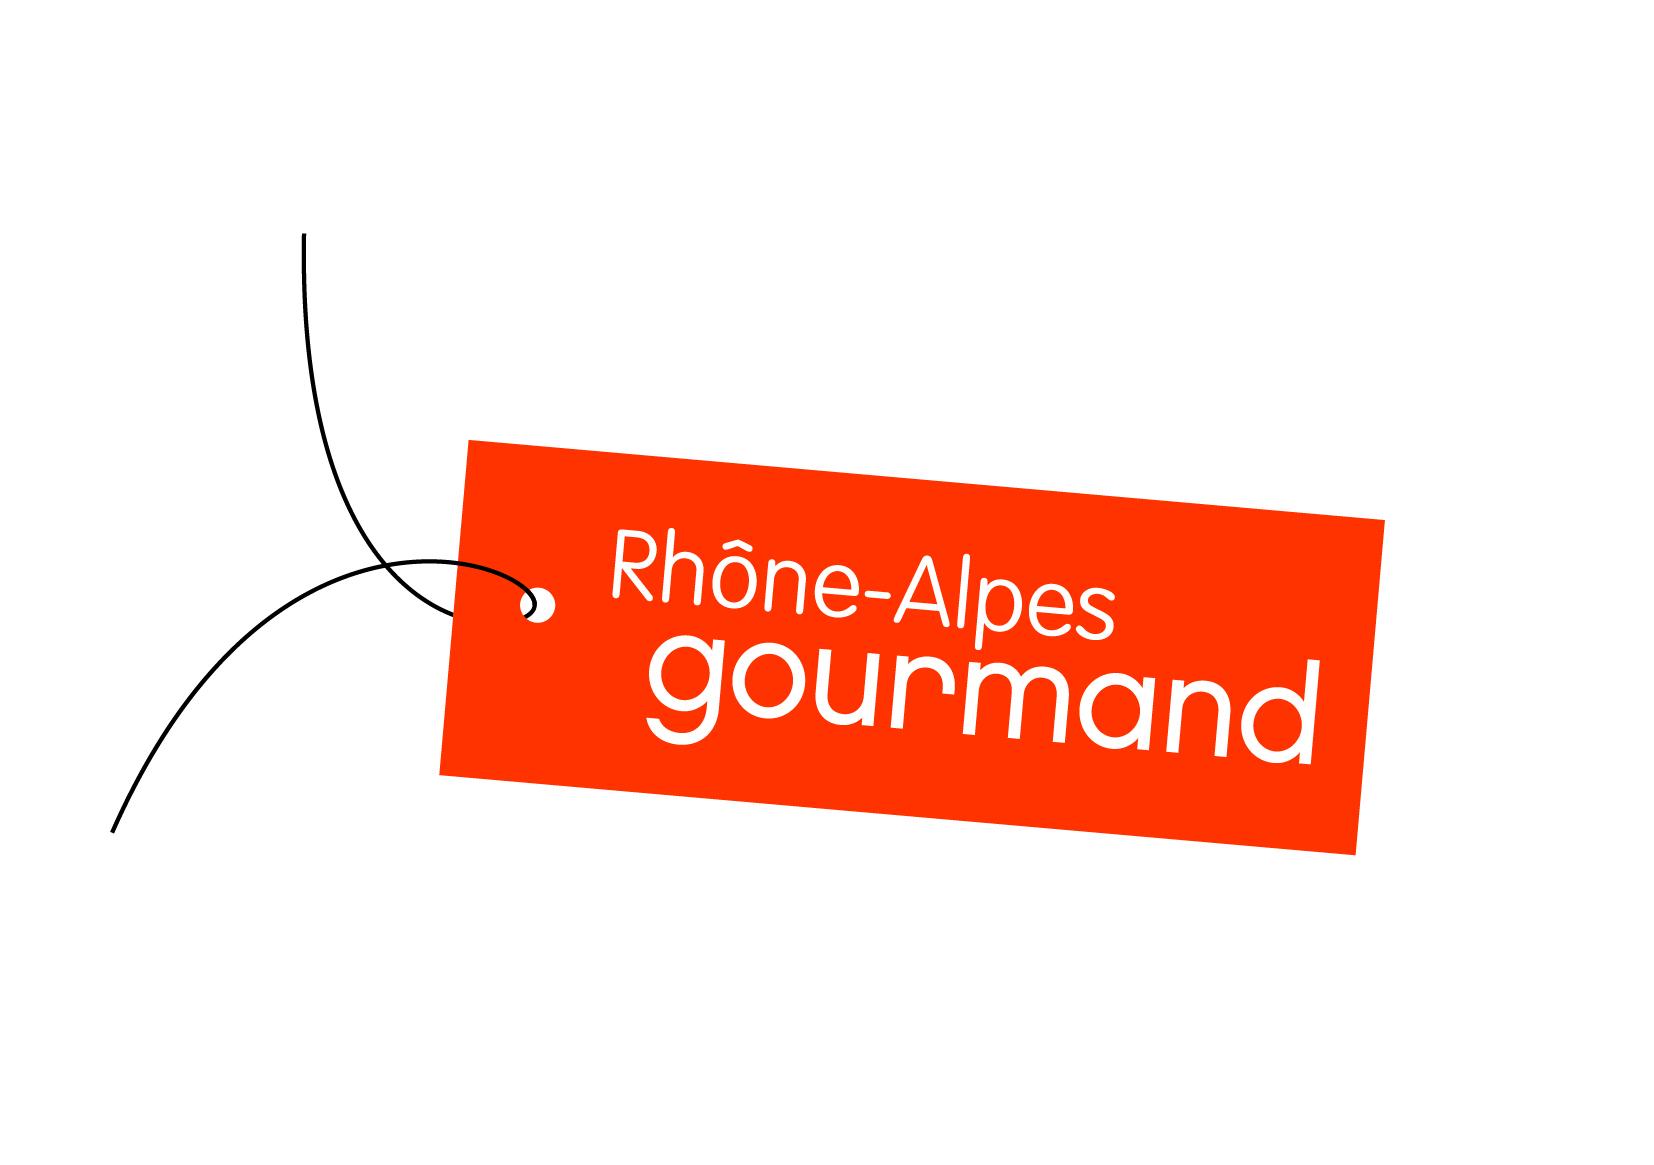 Rh?ne-alpes Gourmand